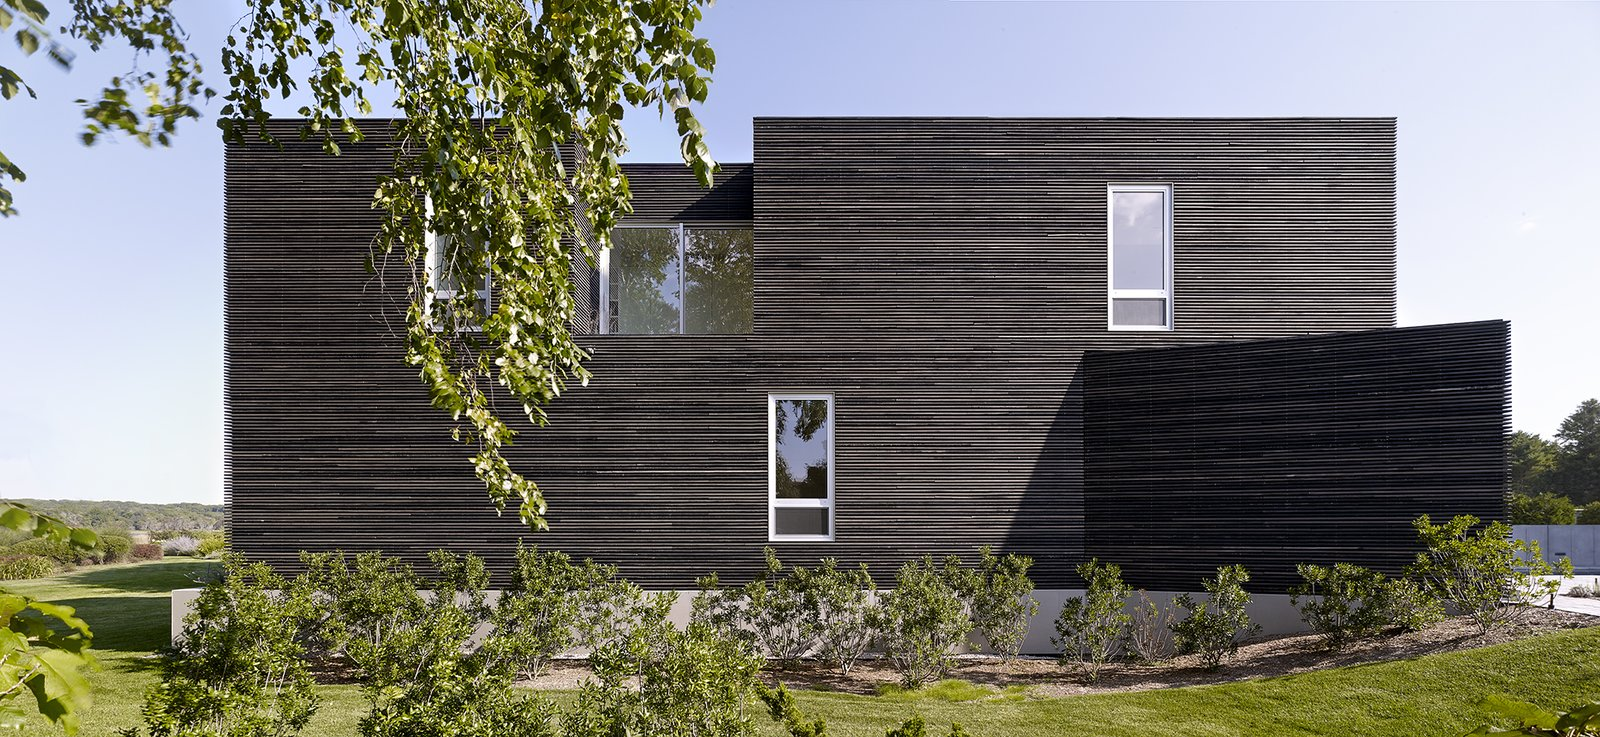 #QuonochontaugHouse #structure #form #coastal #exterior #outside #outdoors #landscape #geometry #modern #midcentury #RhodeIsland #BernheimerArchitects